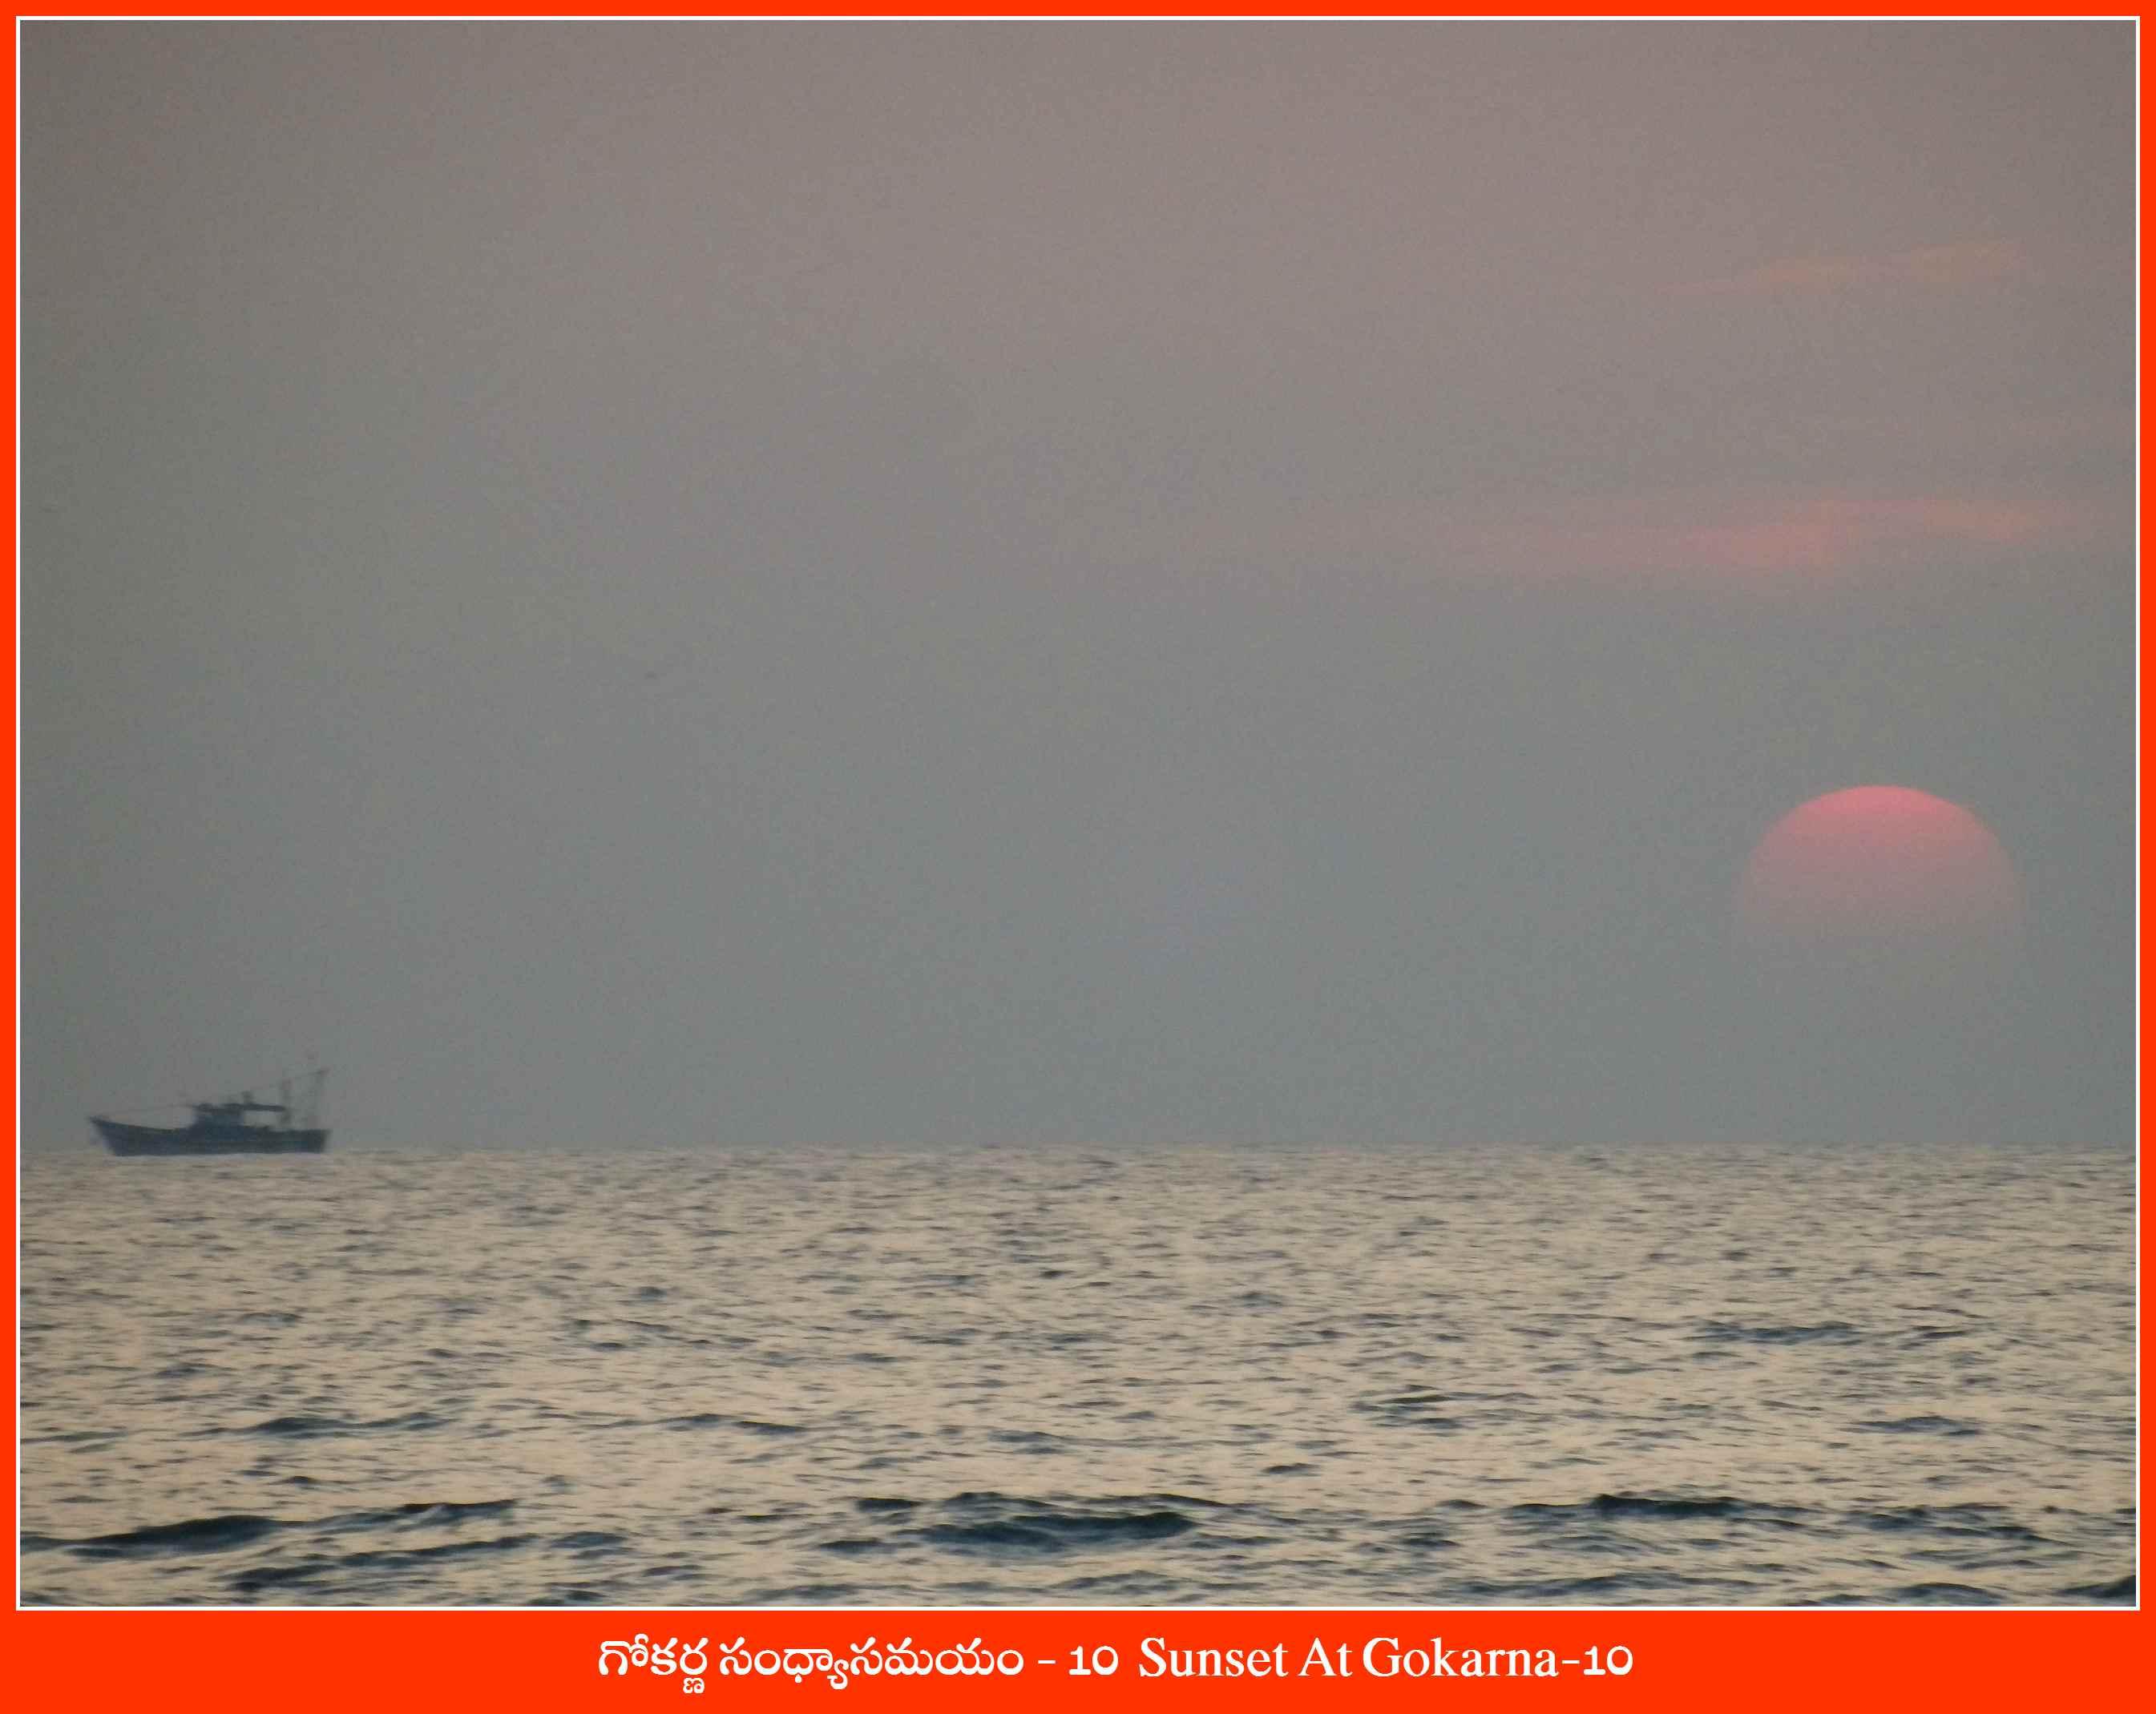 Sunset At Gokarna-10